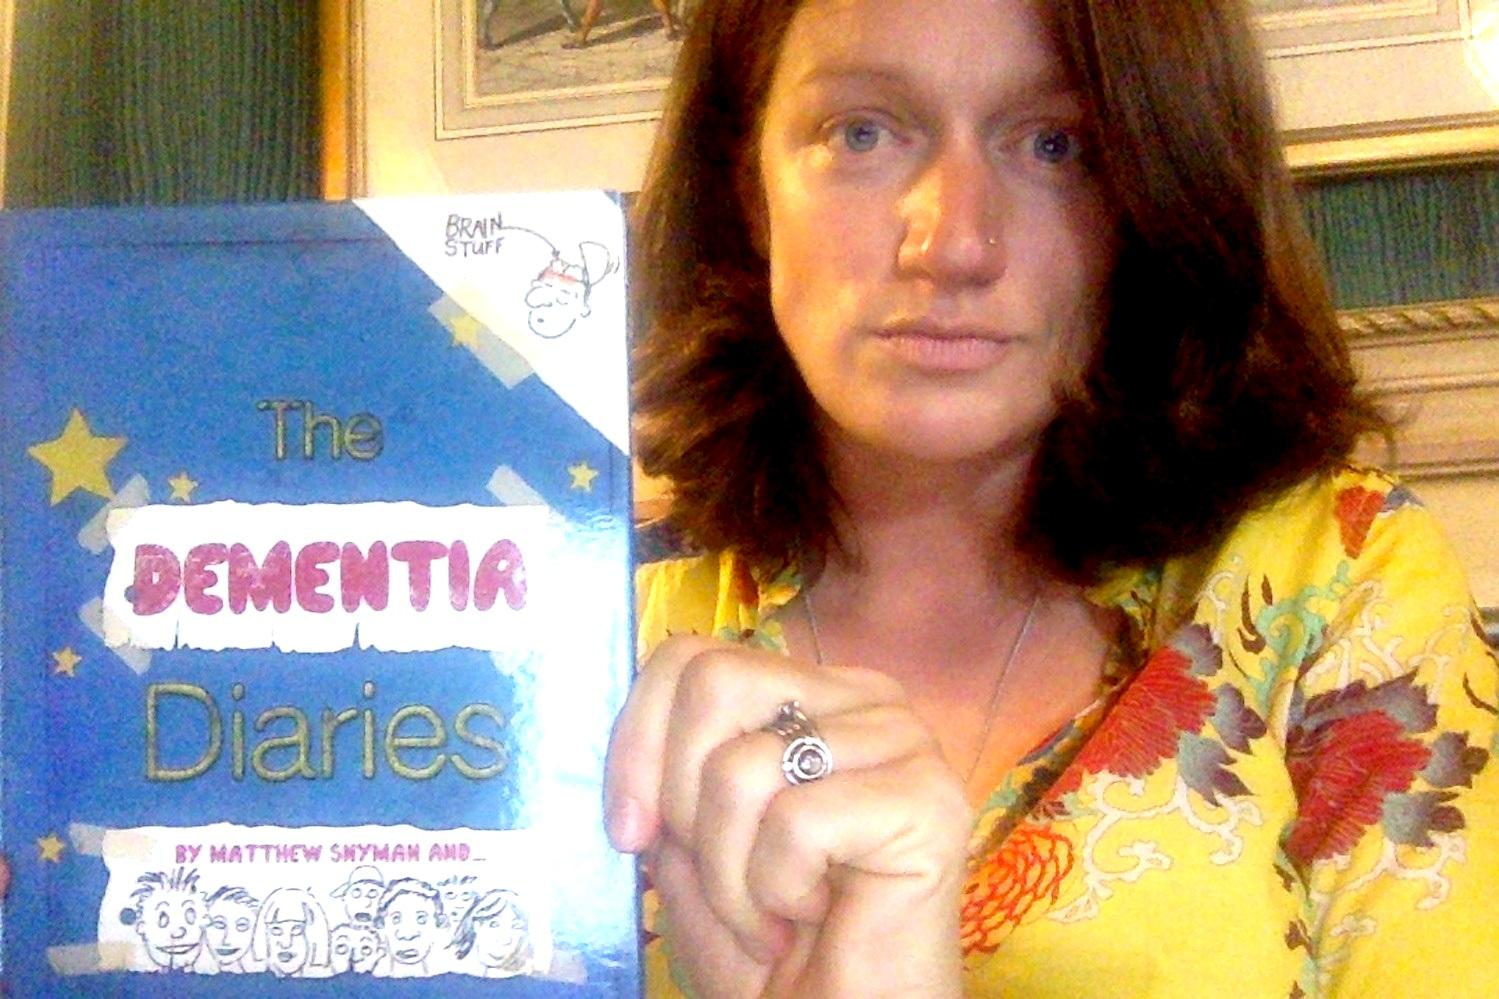 Sharing  The Dementia Diaries  at WHA72